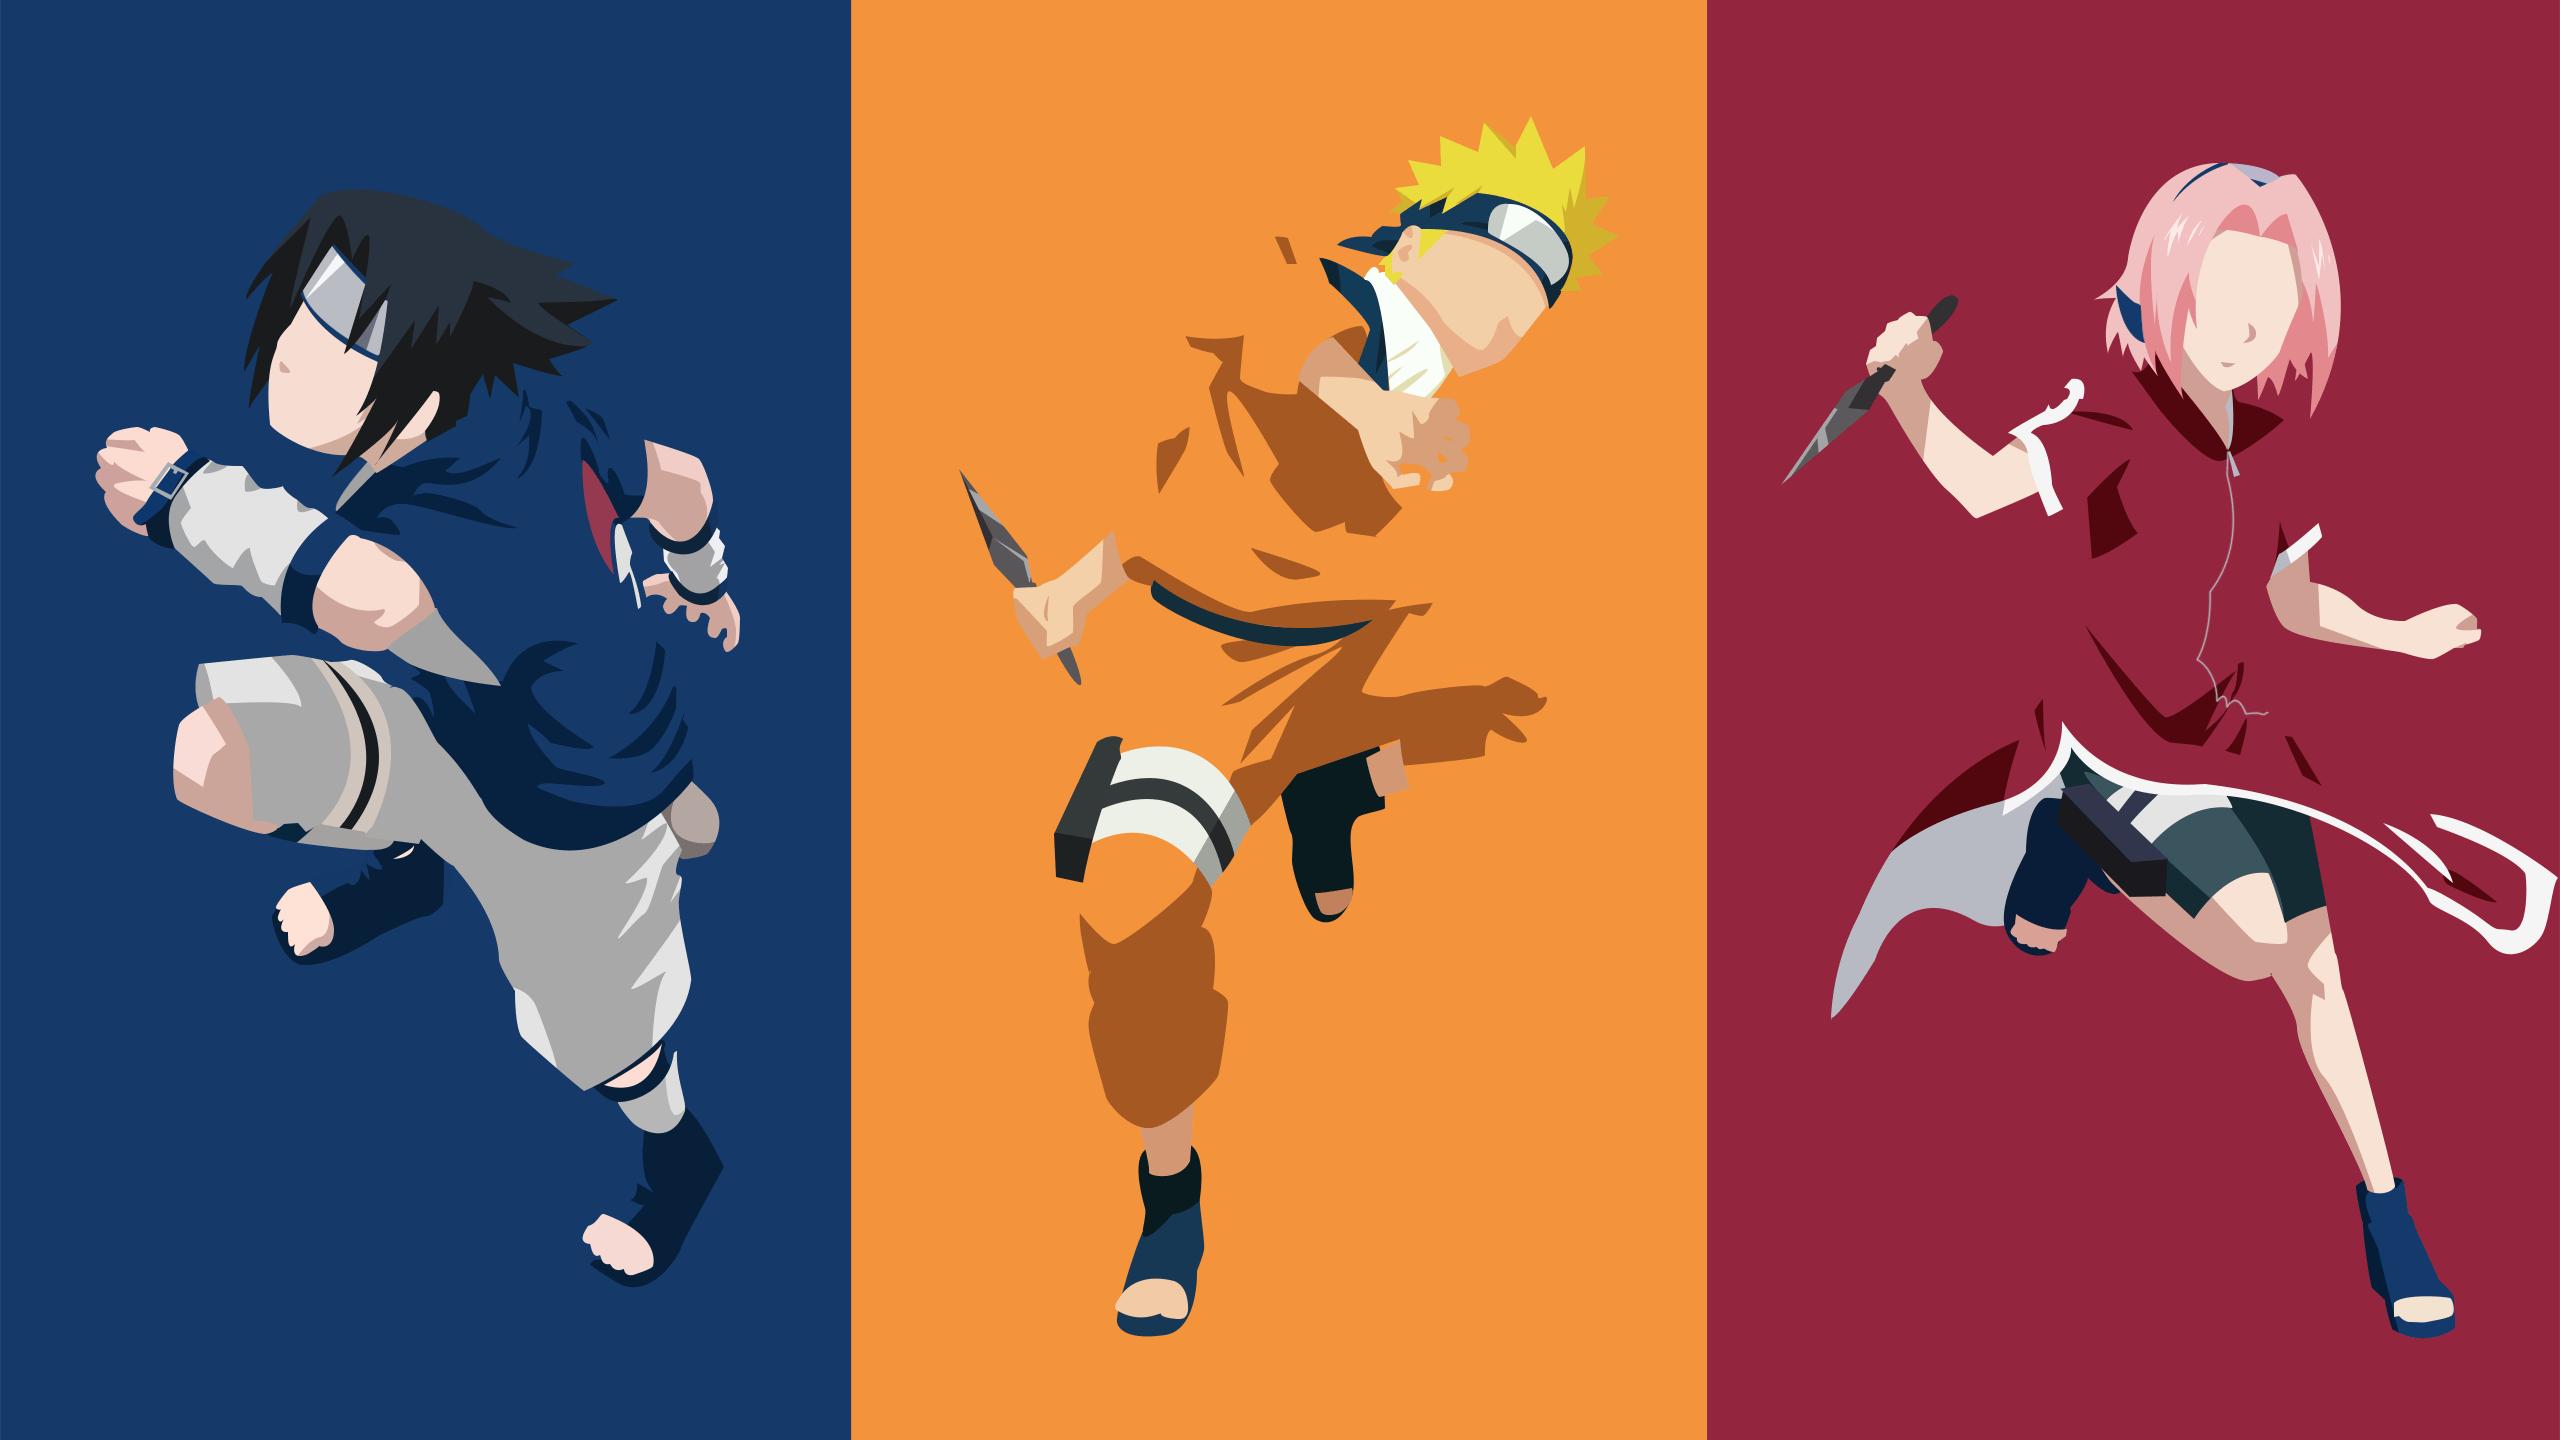 Naruto Minimalist Hd Pc Wallpapers Wallpaper Cave